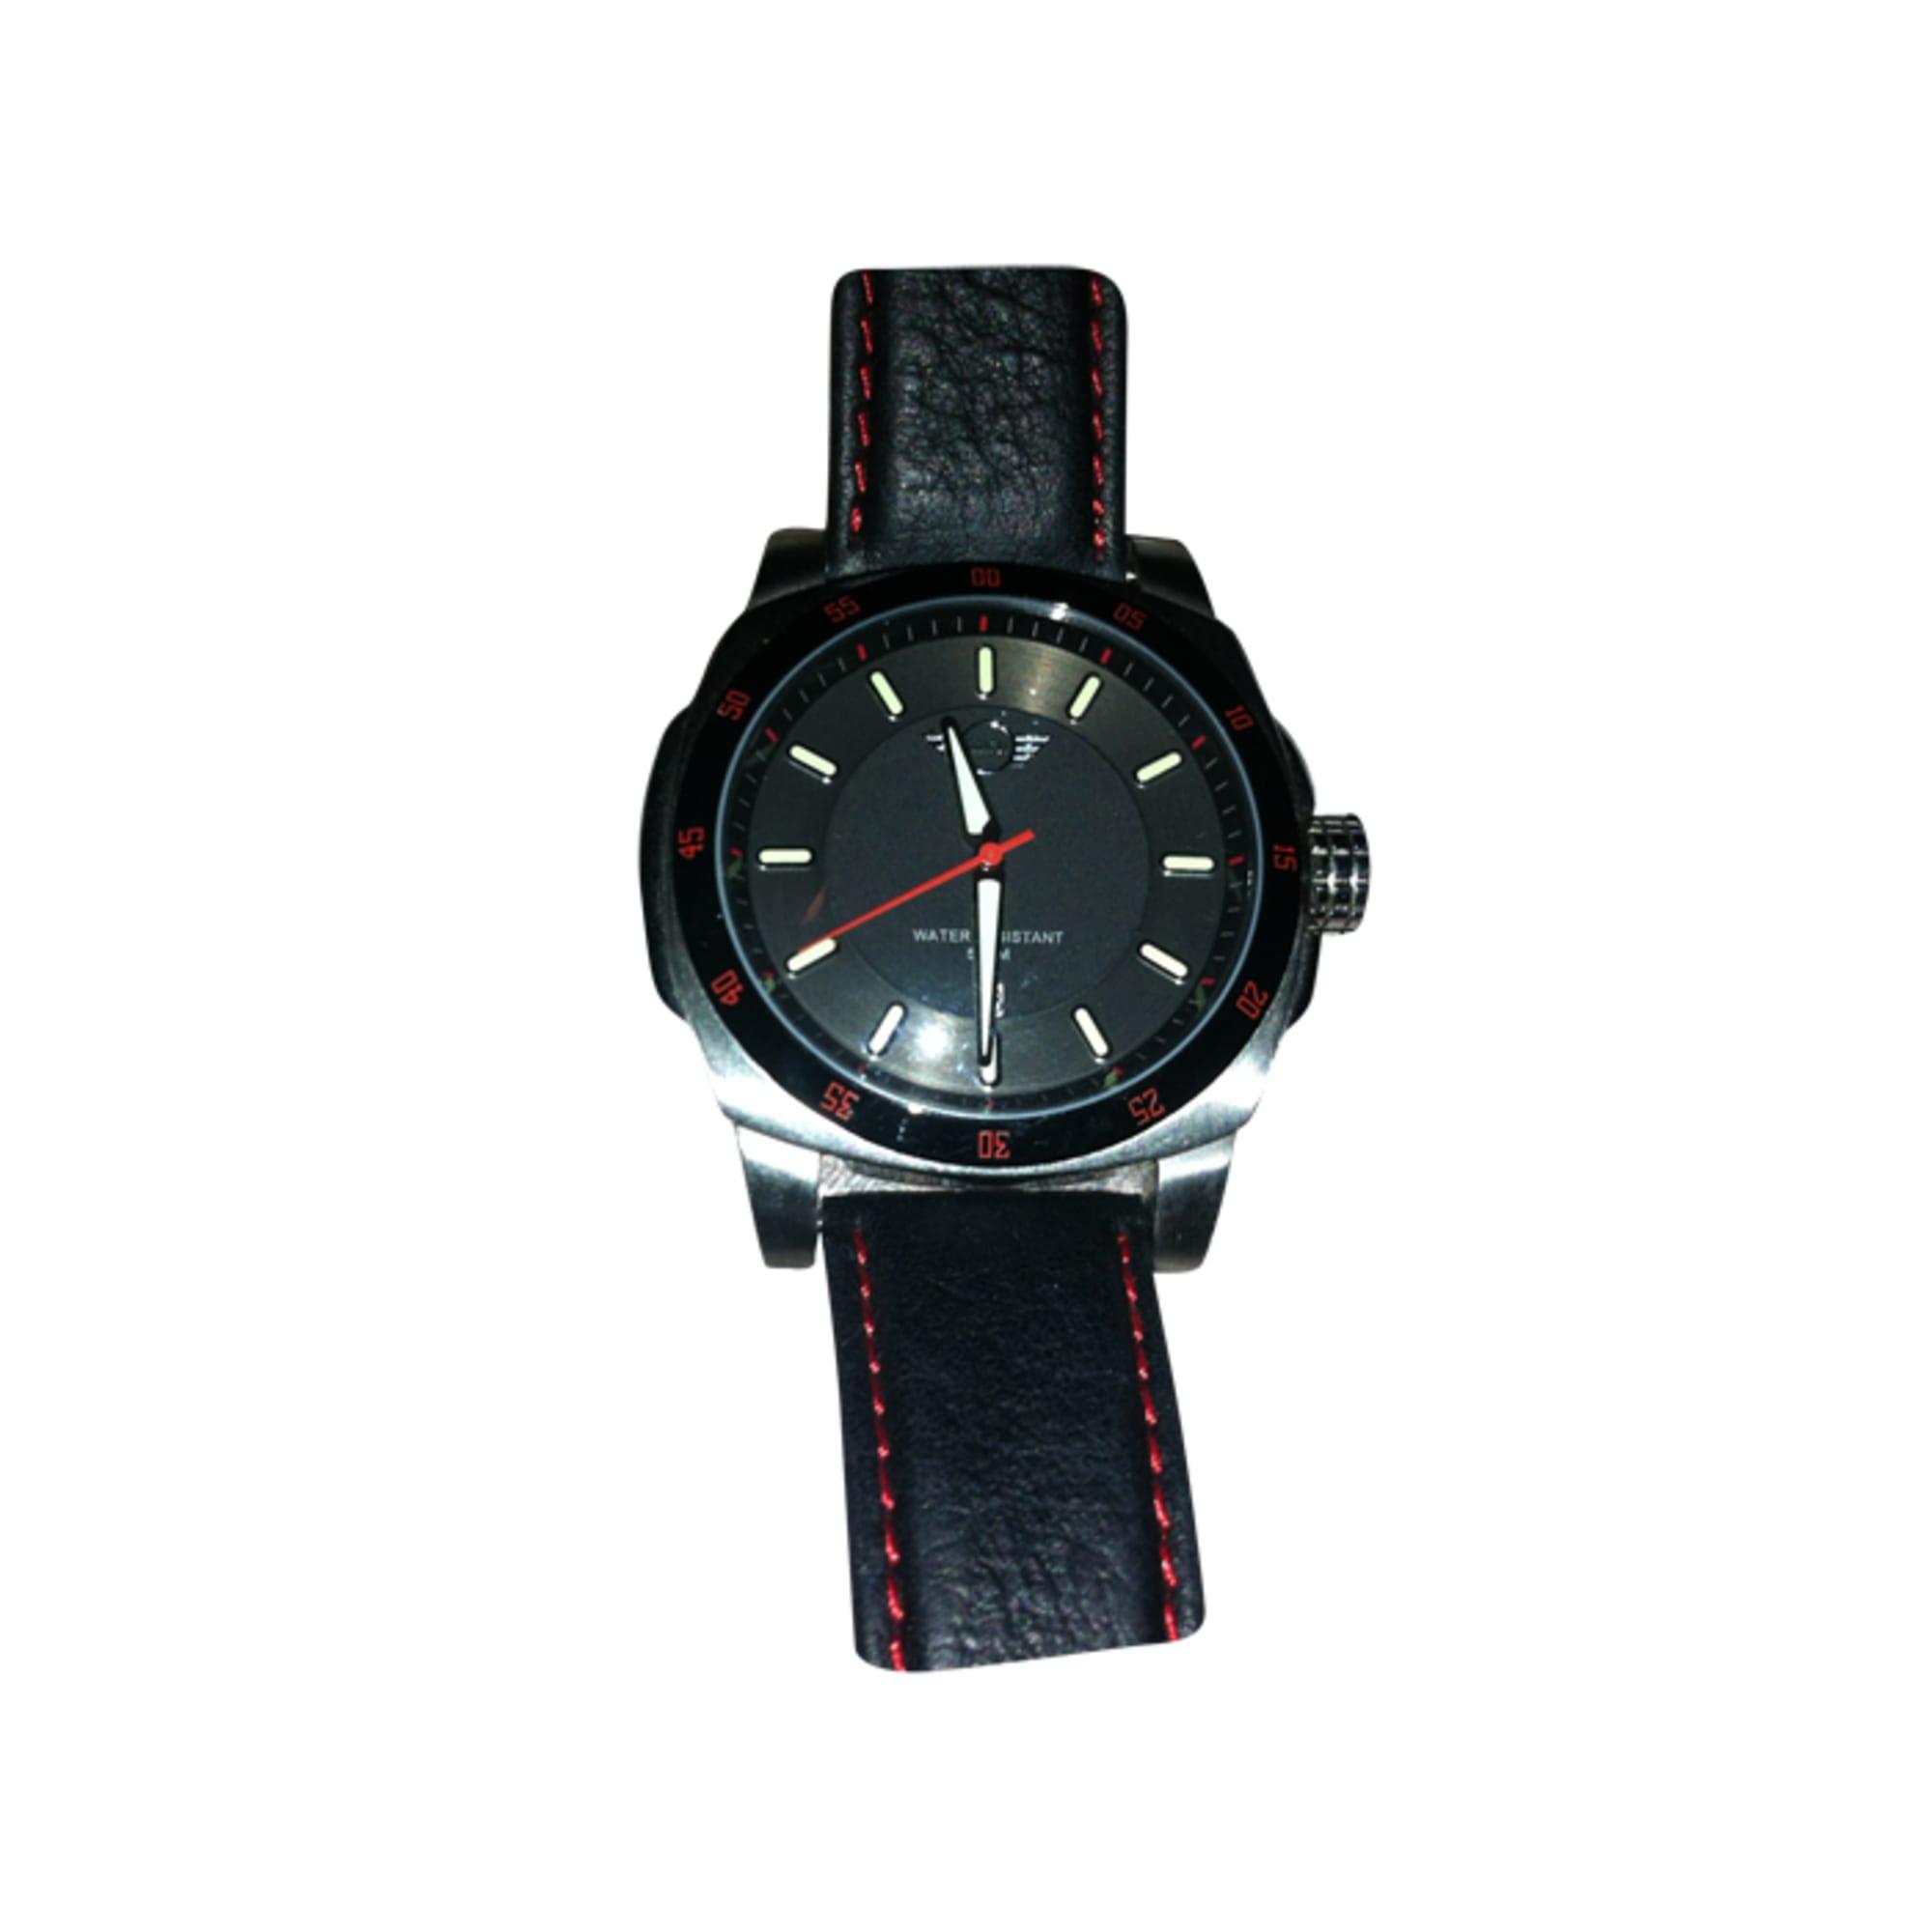 armbanduhr mini cooper schwarz vendu par lnb37112 857721. Black Bedroom Furniture Sets. Home Design Ideas